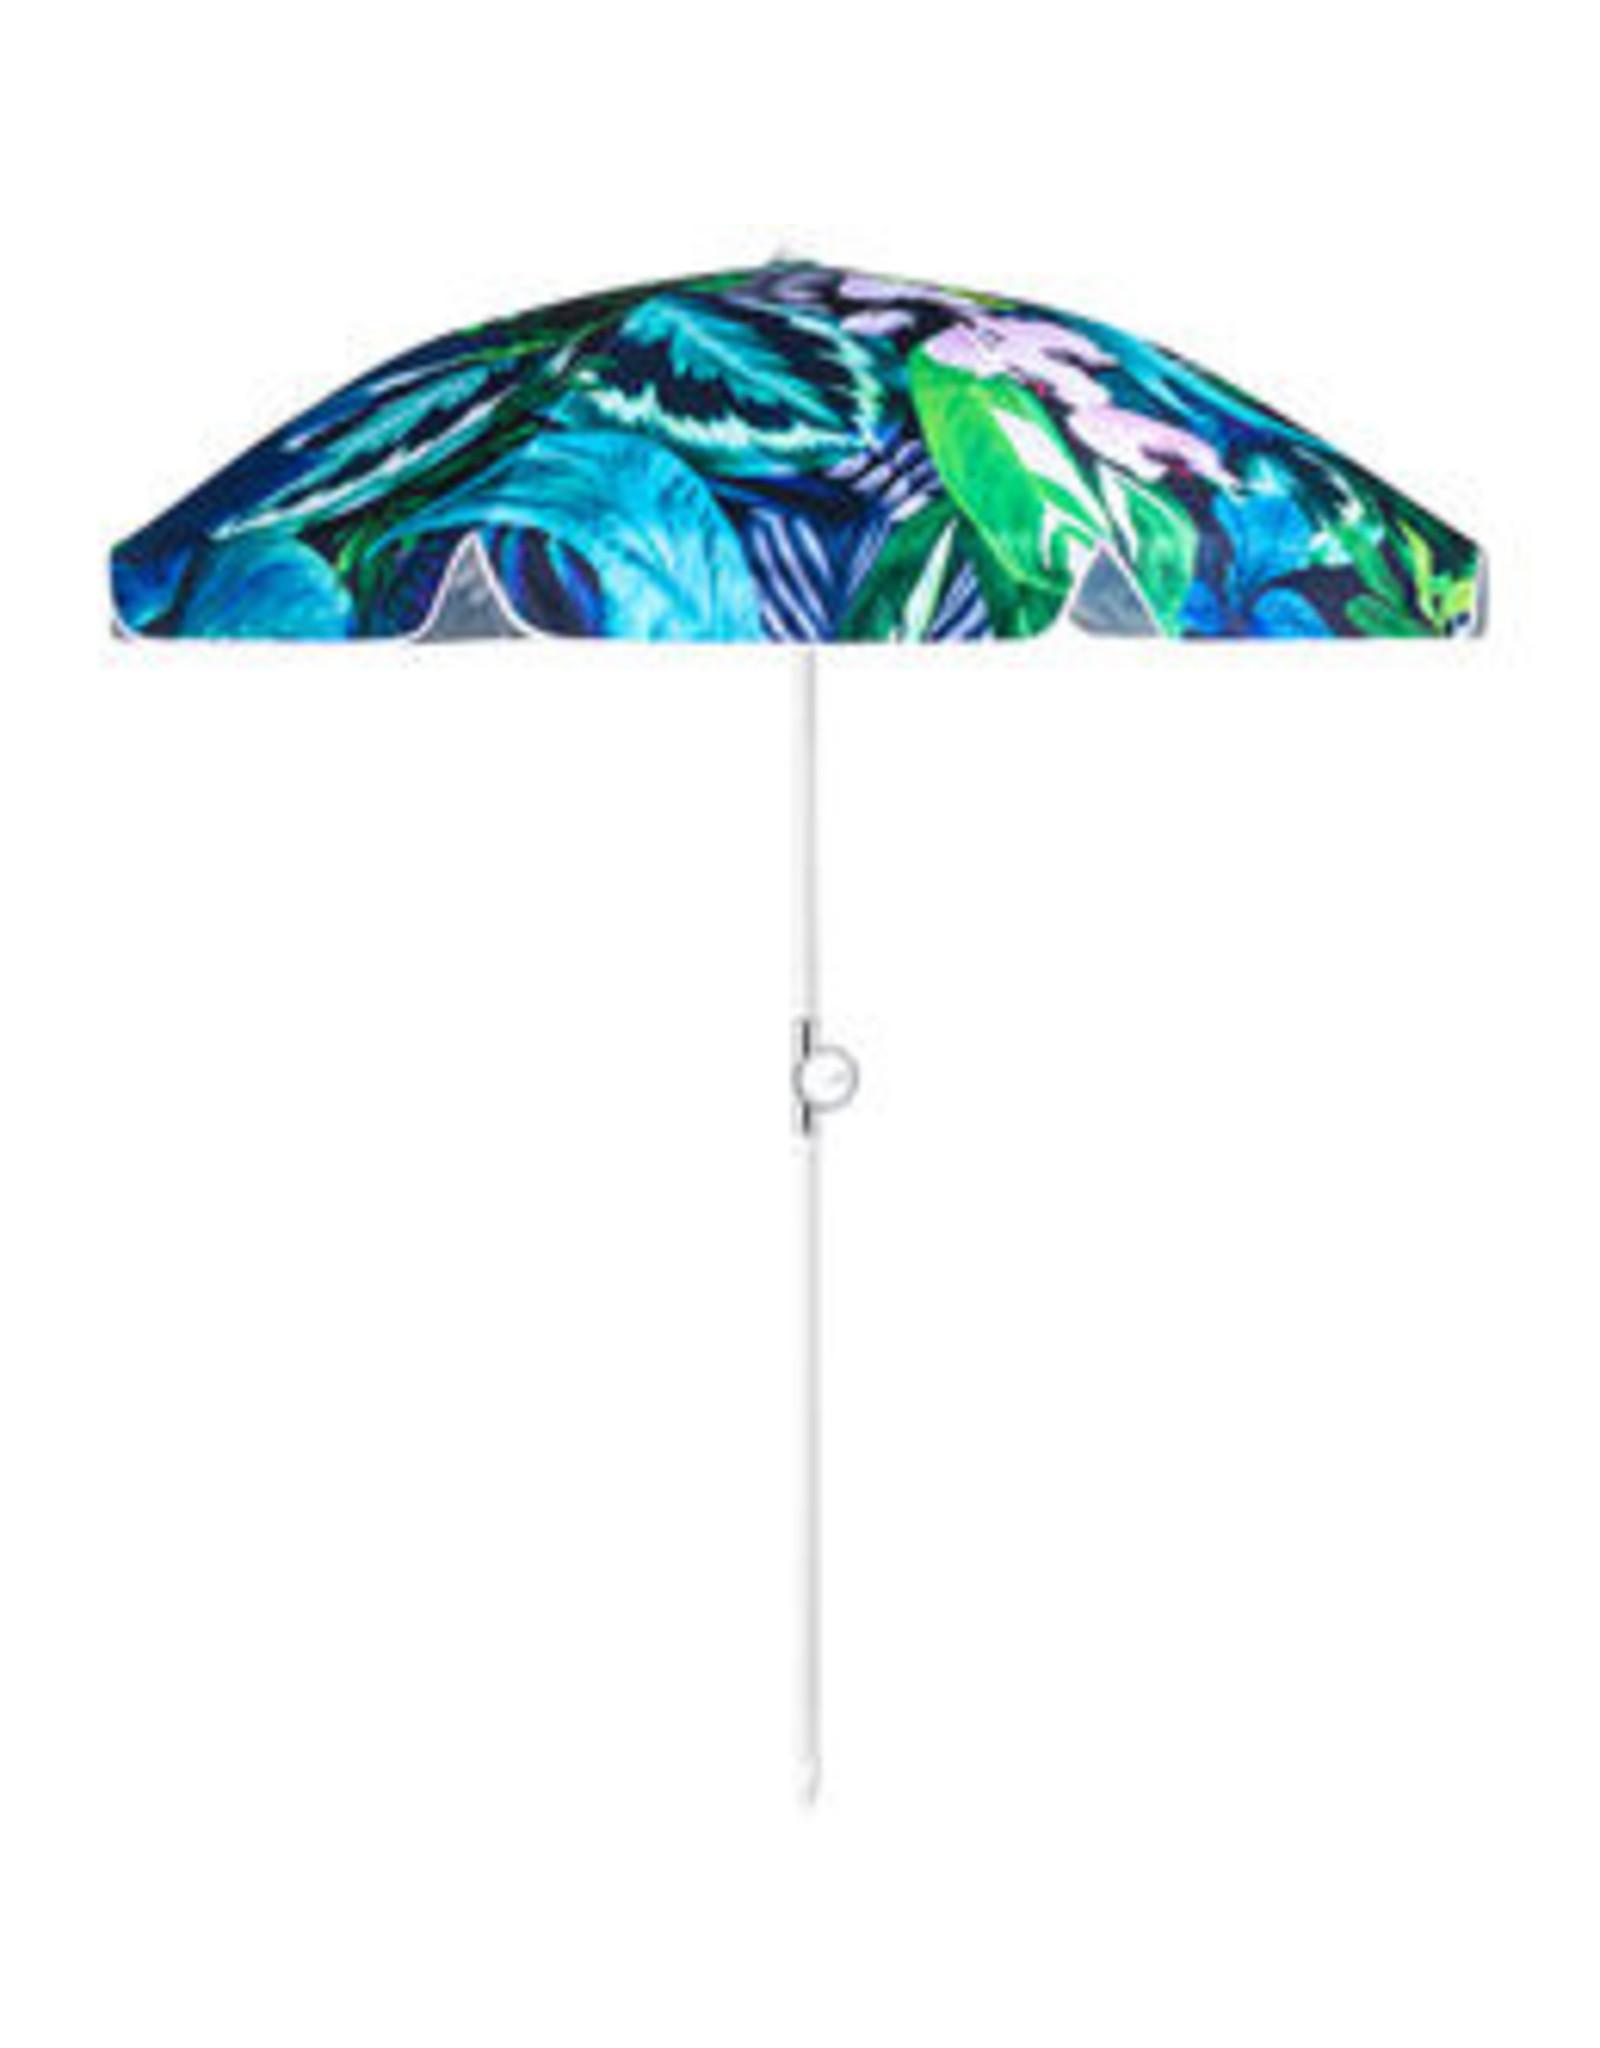 Basil Bangs Botanica Beach Umbrella